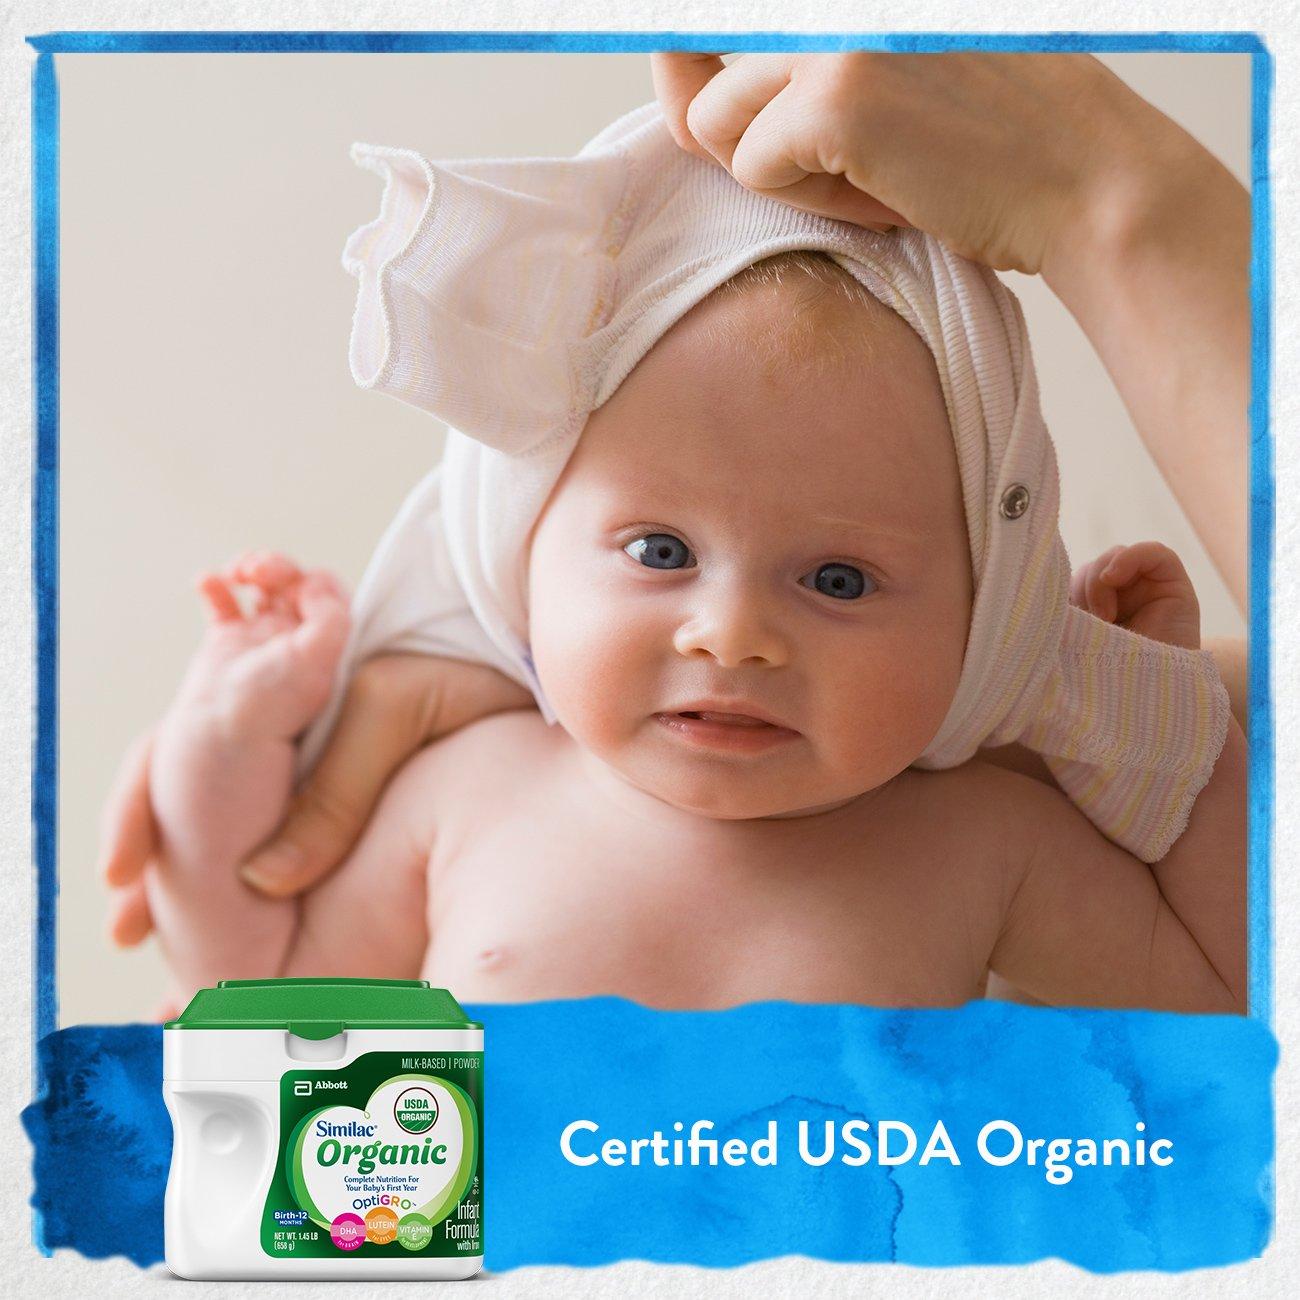 Similac Organic Infant Formula with Iron, USDA Certified Organic, Baby Formula, Powder, 1.45 lb (Pack of 6) by Similac (Image #3)